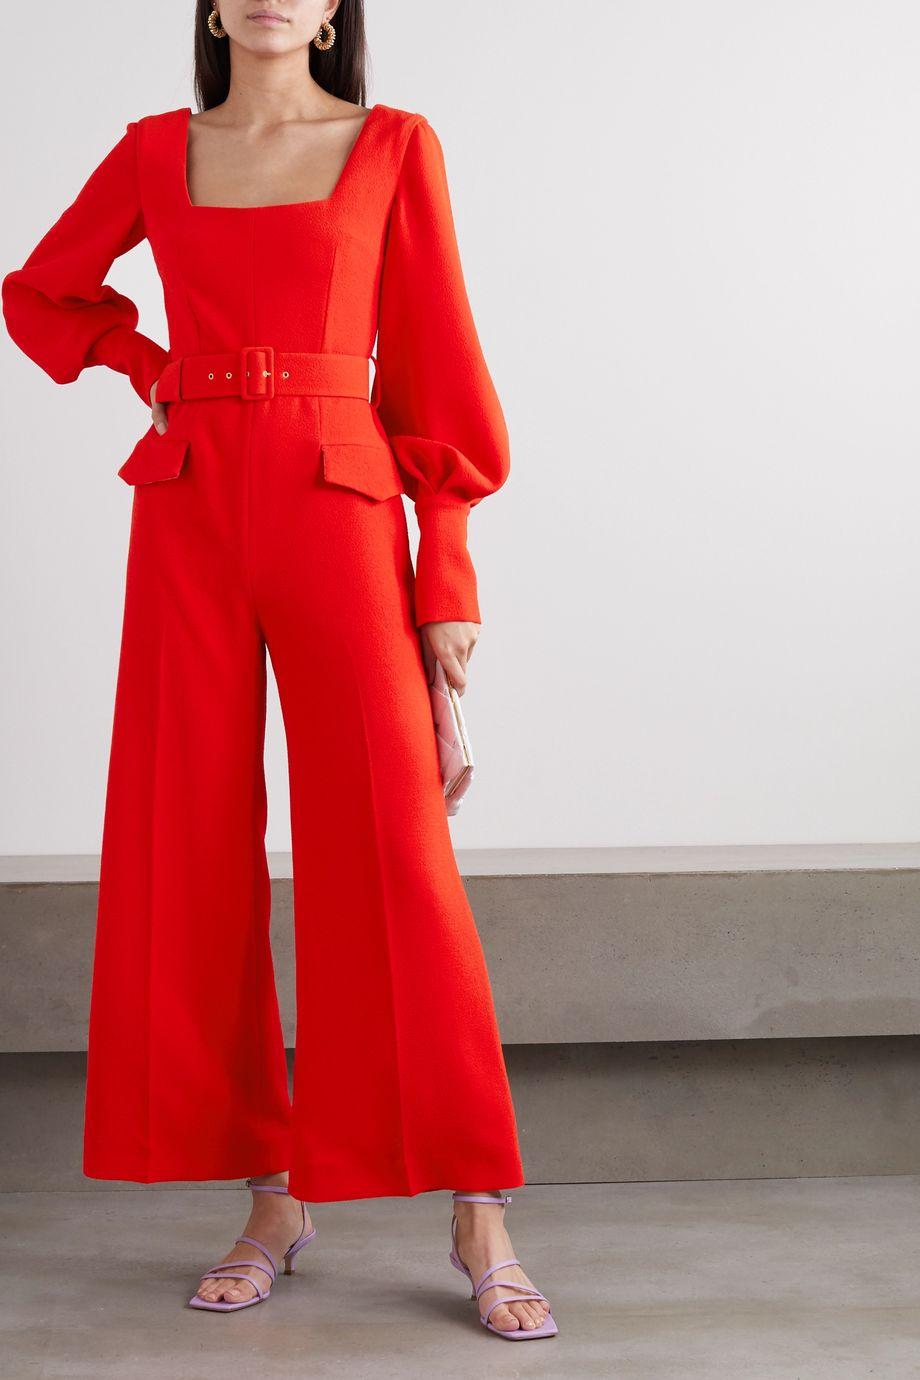 Emilia Wickstead Patrice belted crepe jumpsuit